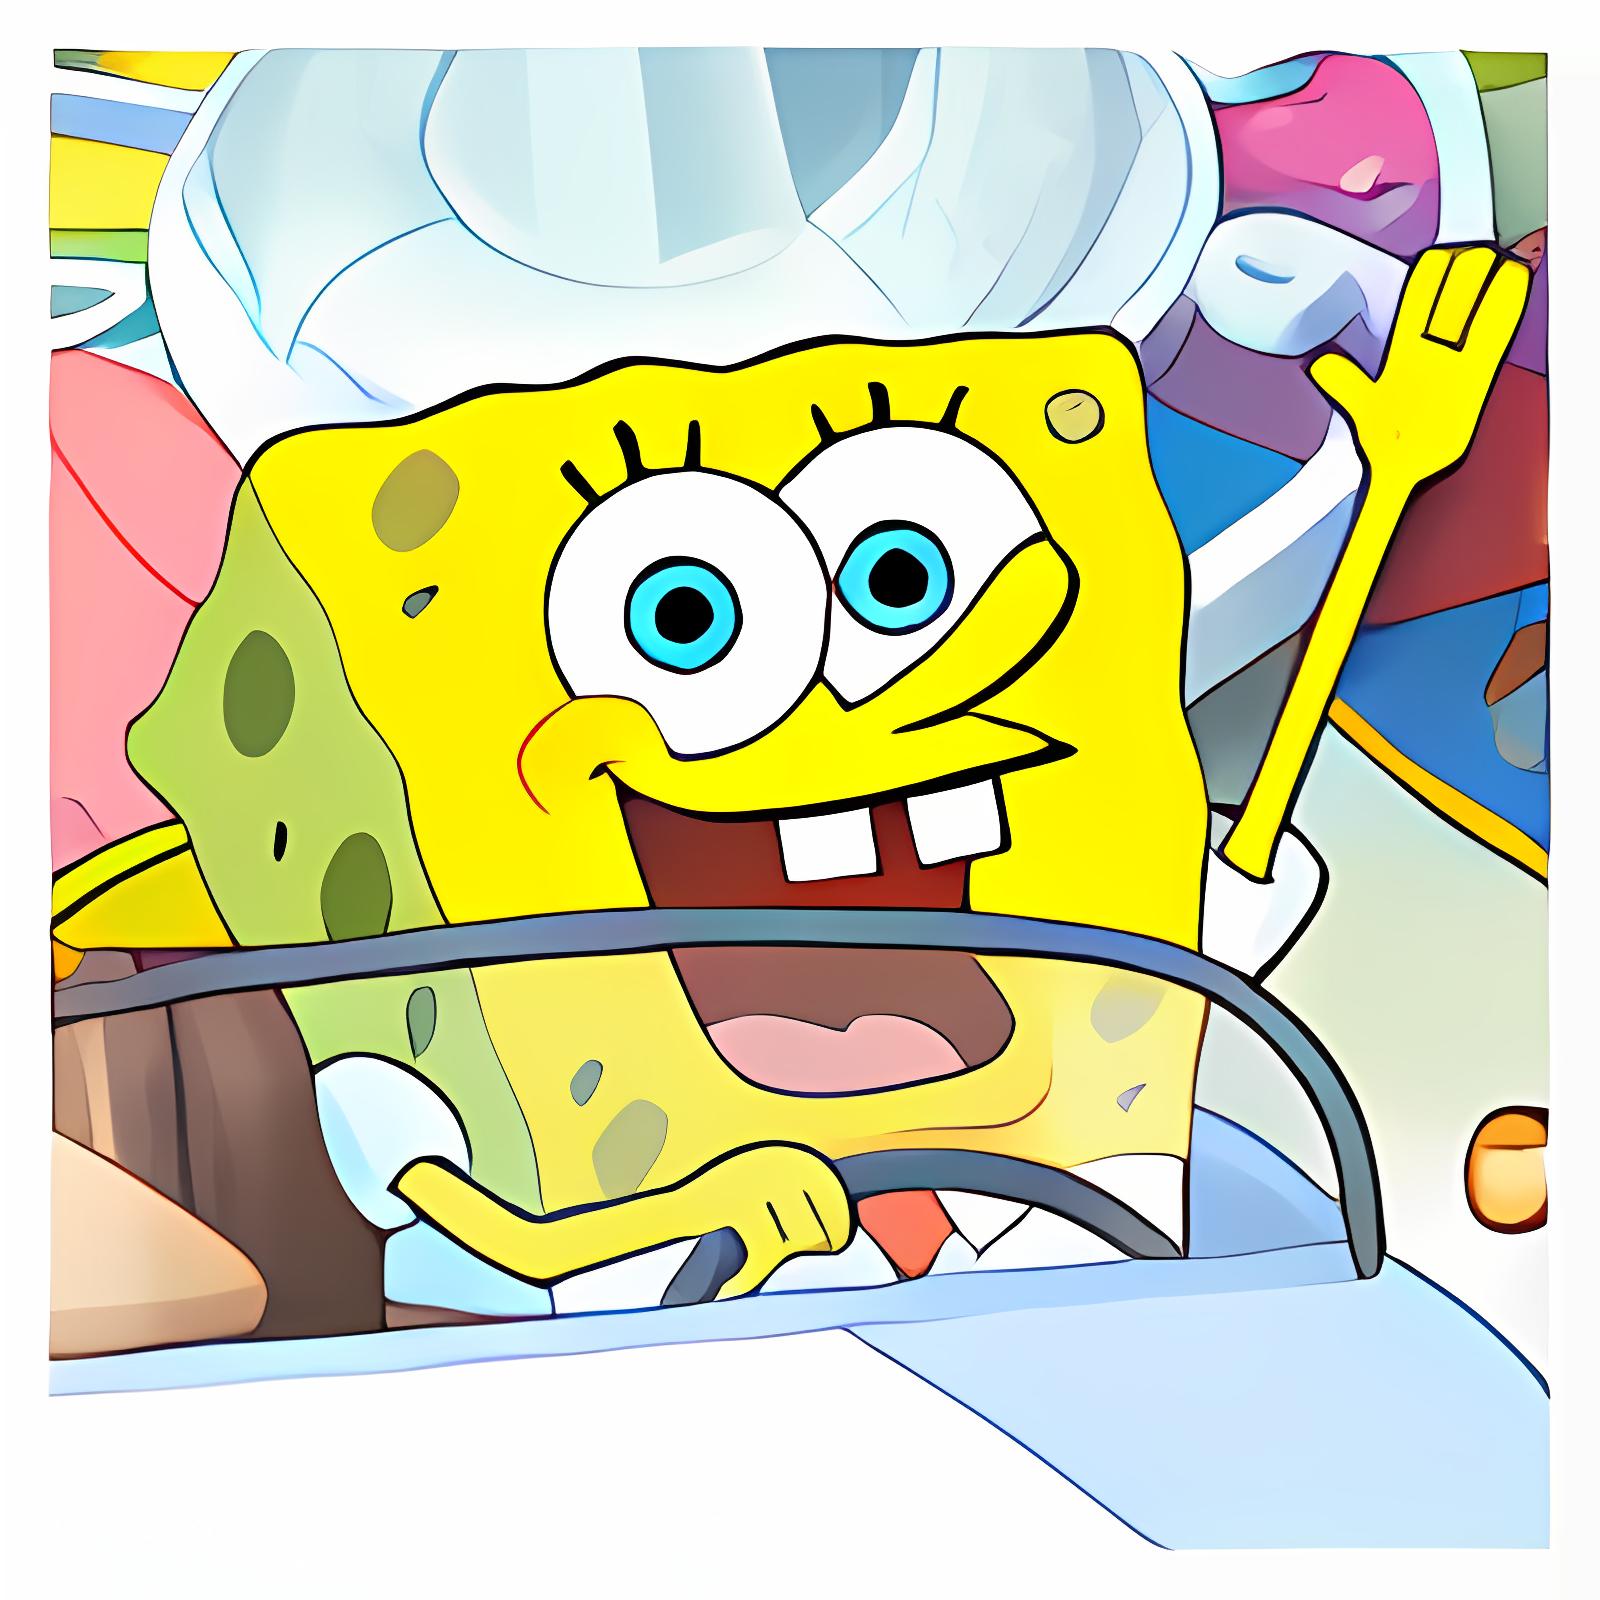 SpongeBob SquarePants - The Game of life